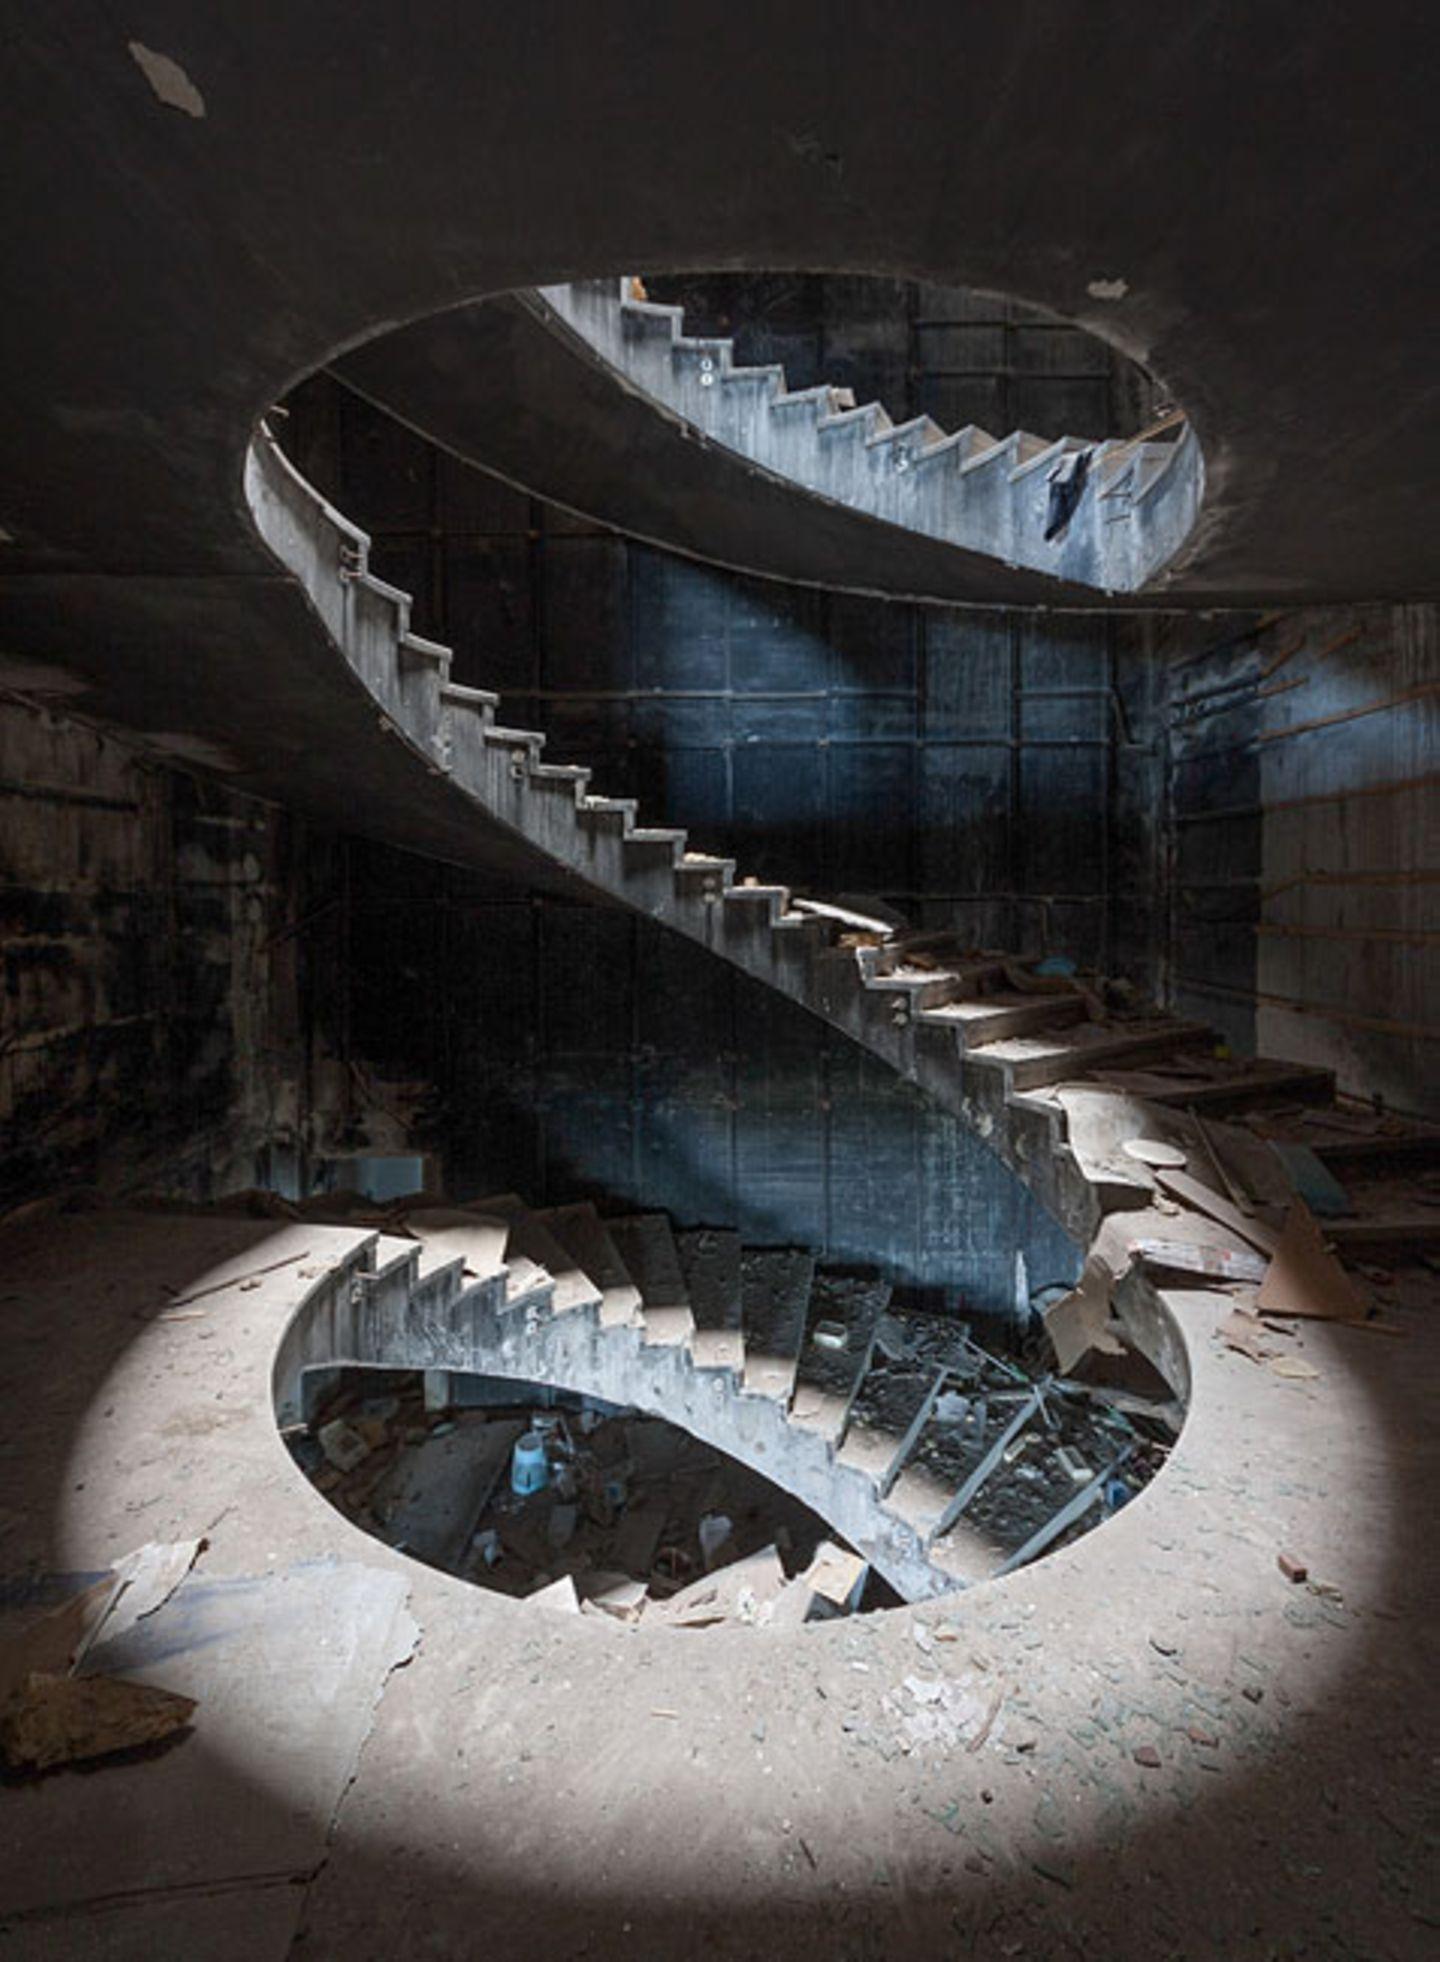 Treppenhaus des Hotels Belvedere in Dubrovnik